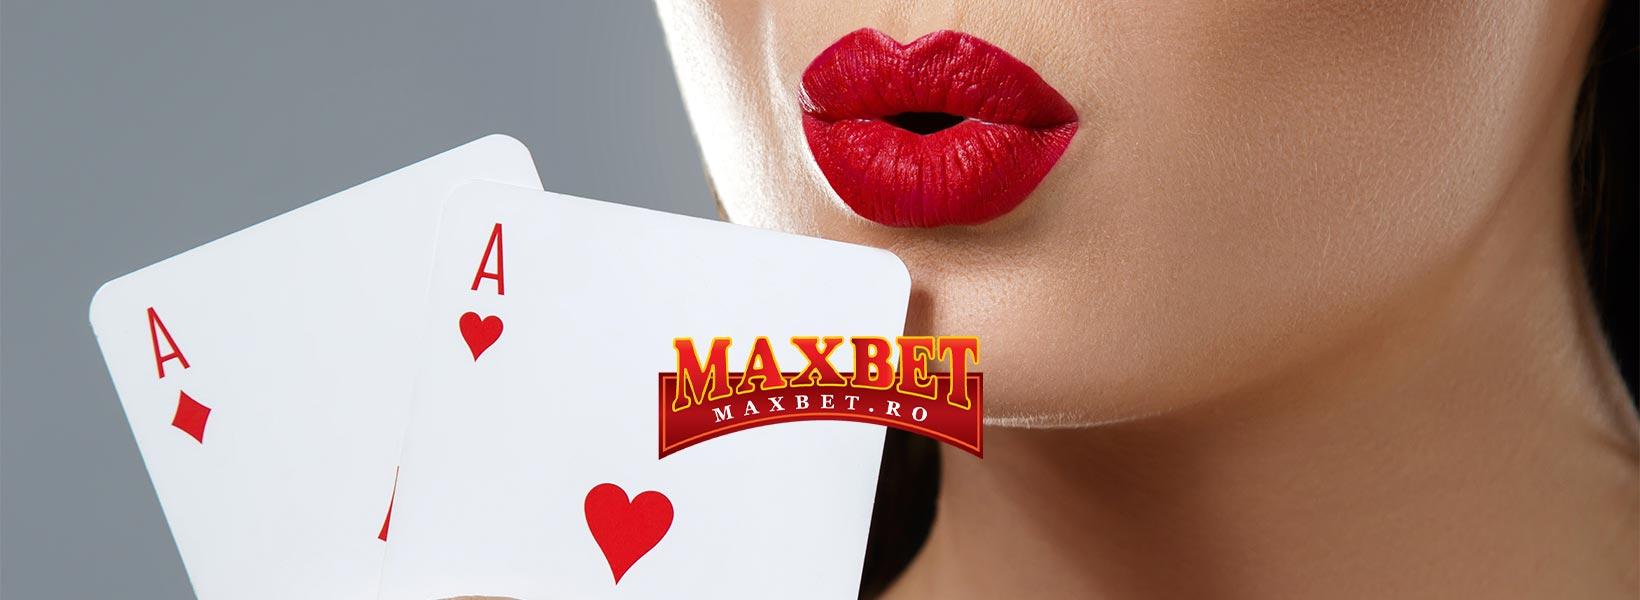 blackjack maxbet